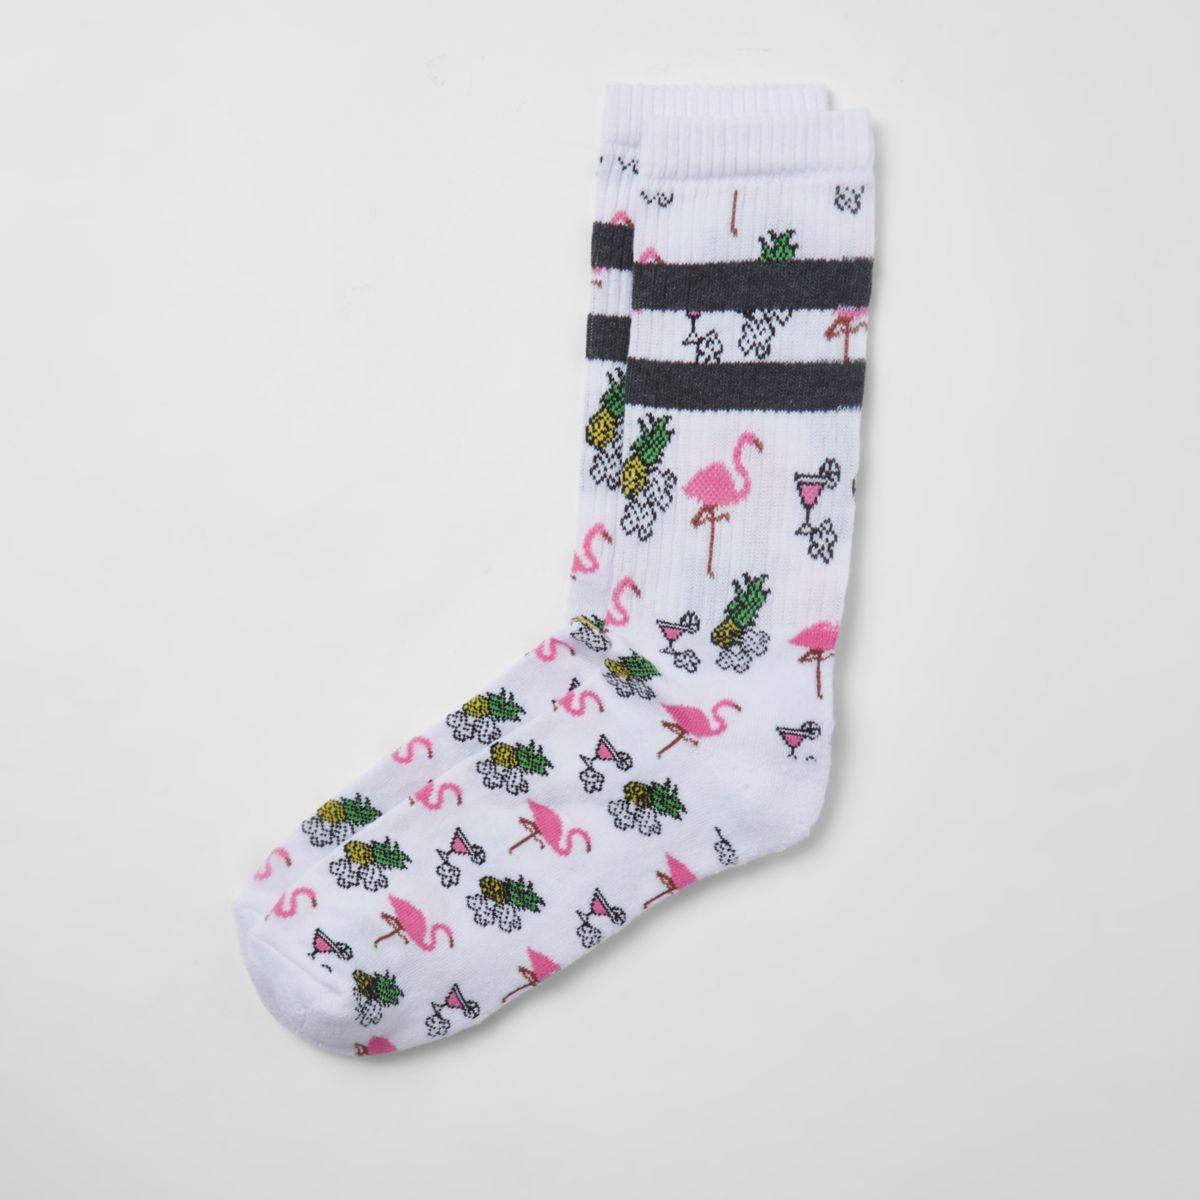 White flamingo novelty socks